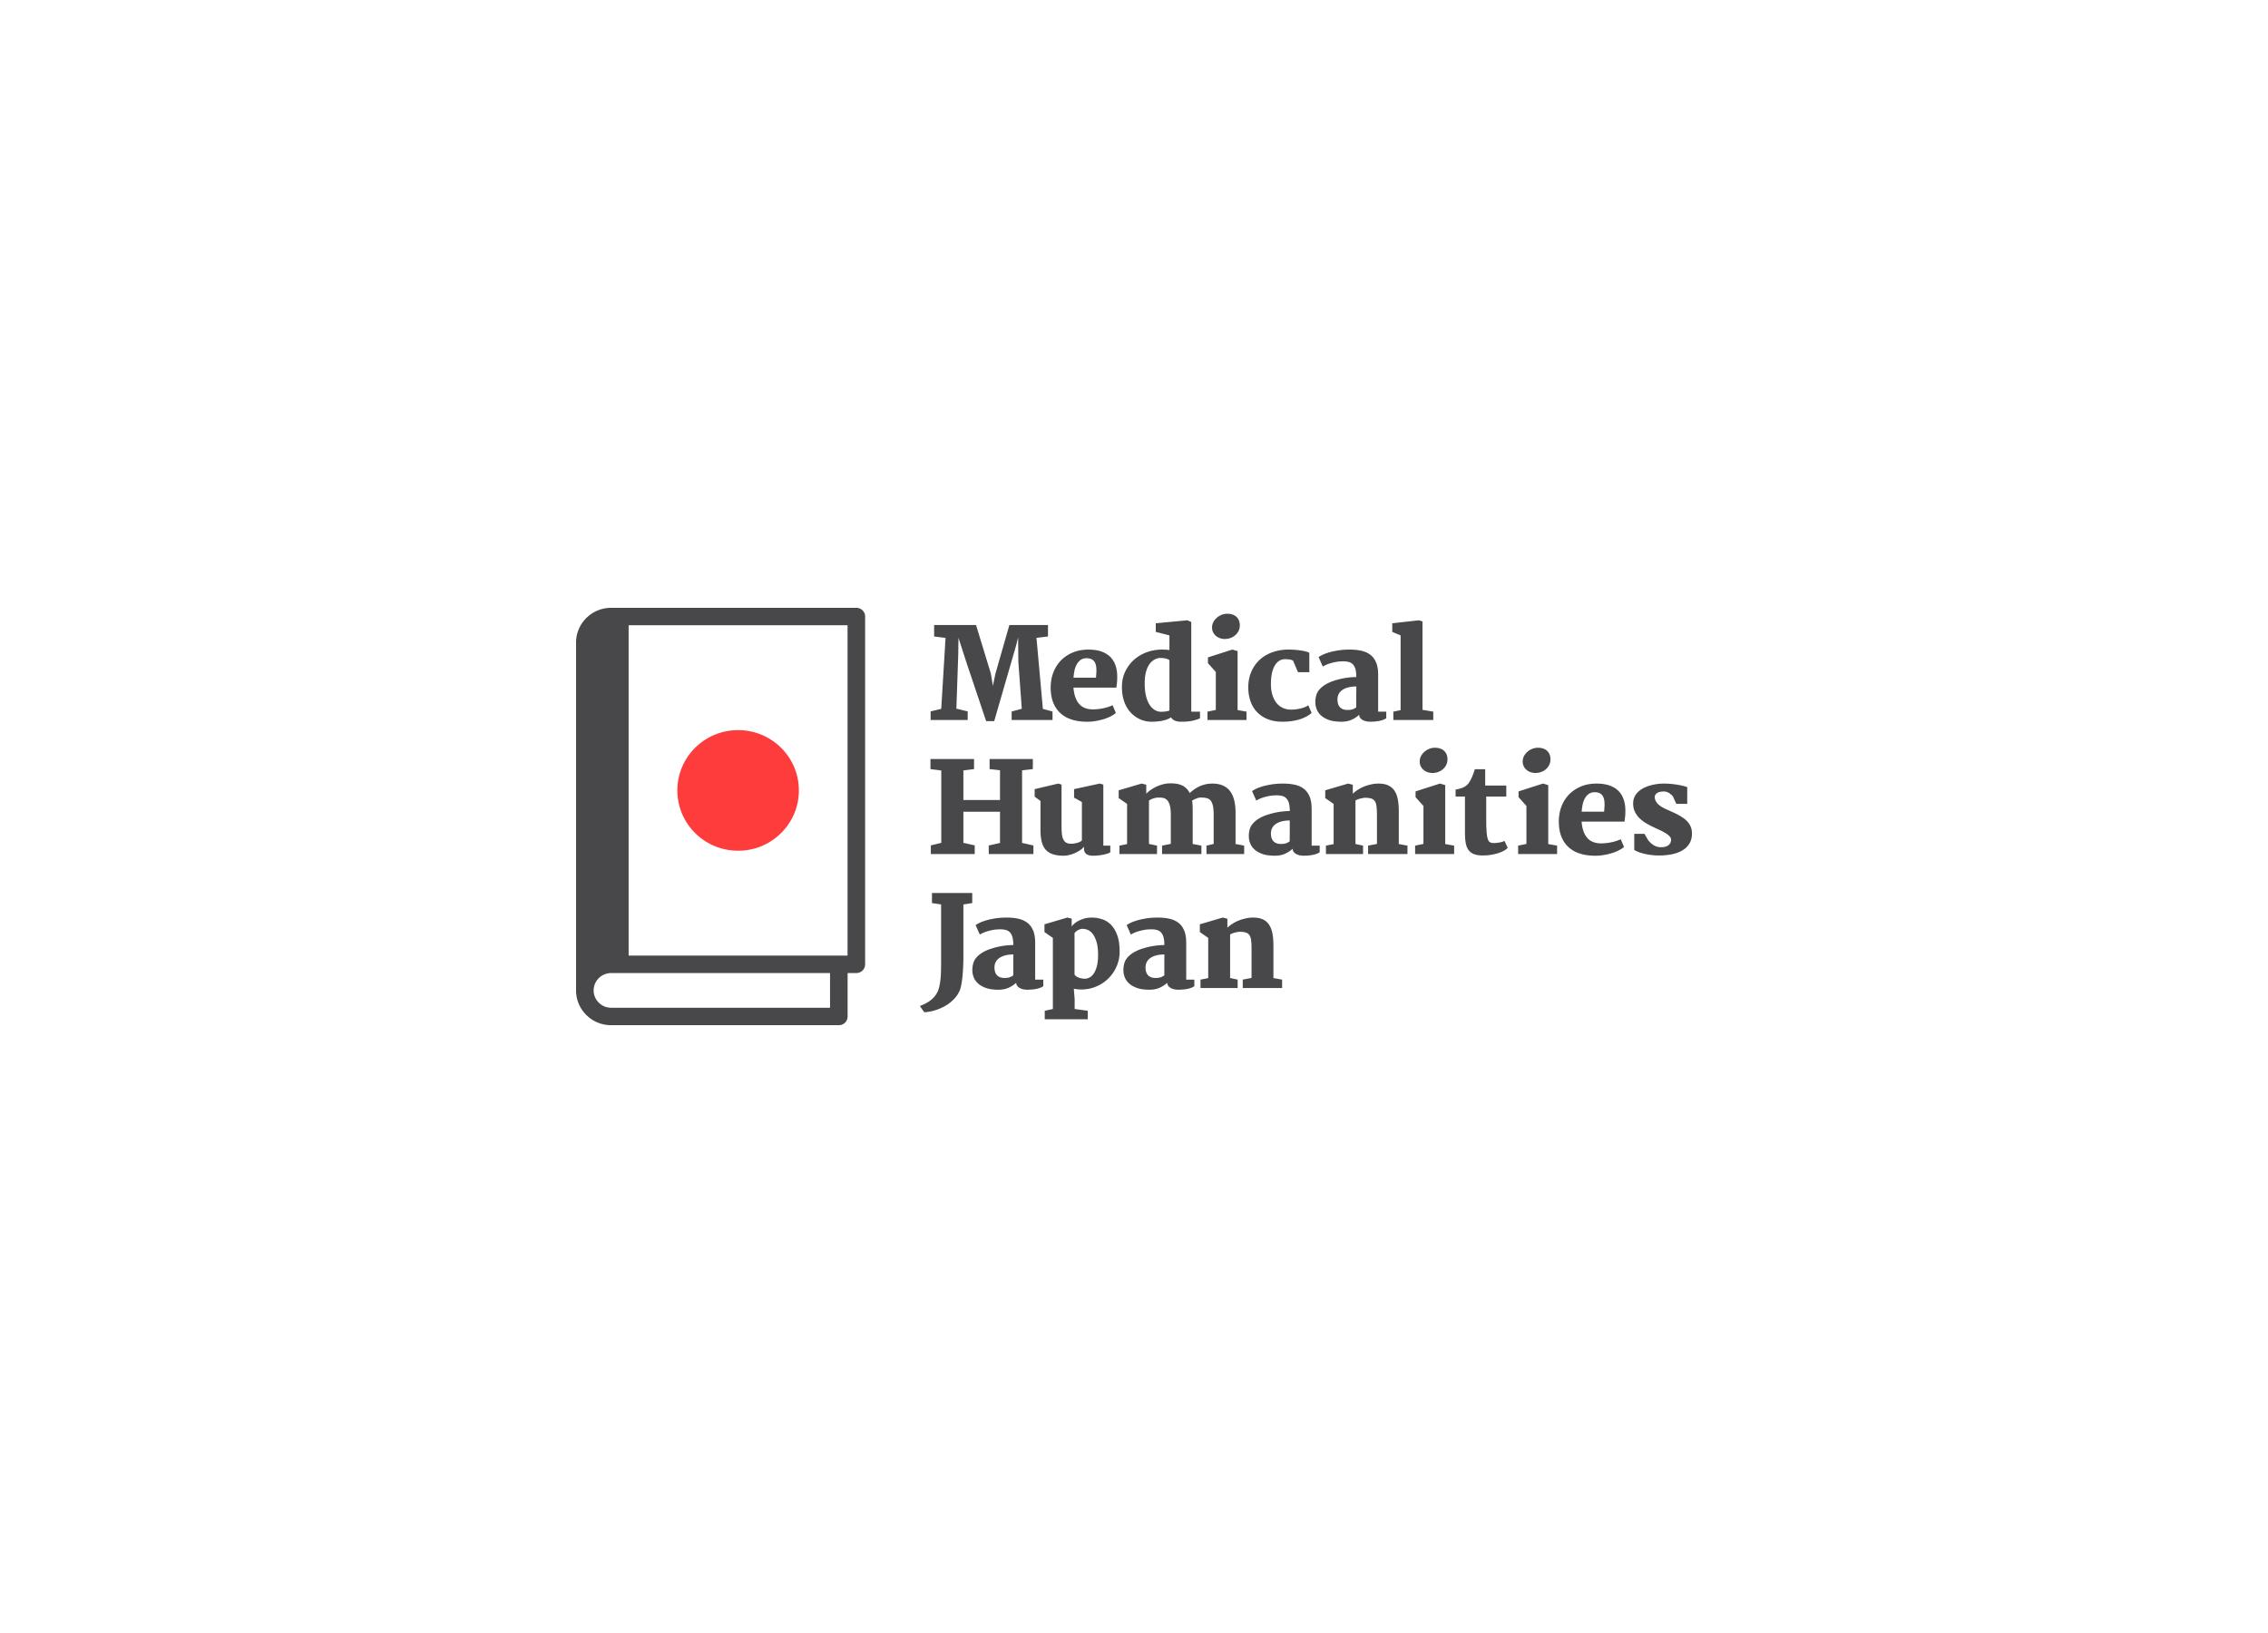 Medical-Humanities-Japan.png